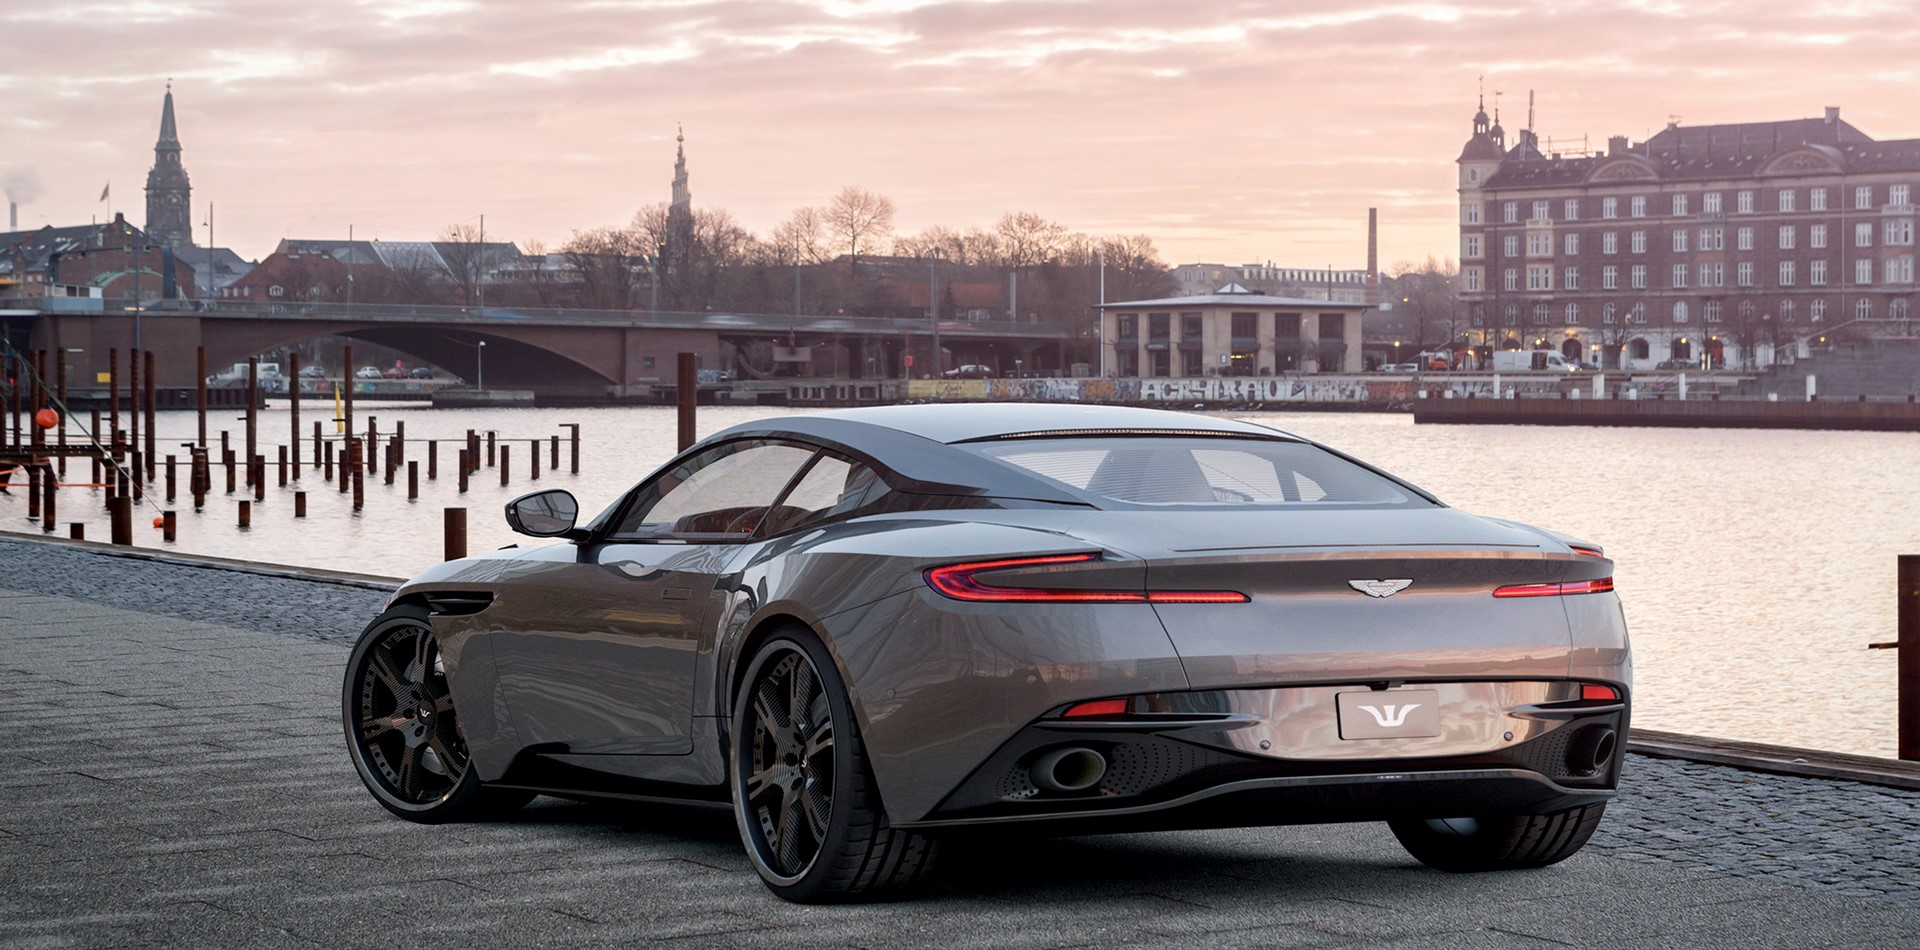 Aston Martin DB11 Wheelsandmore